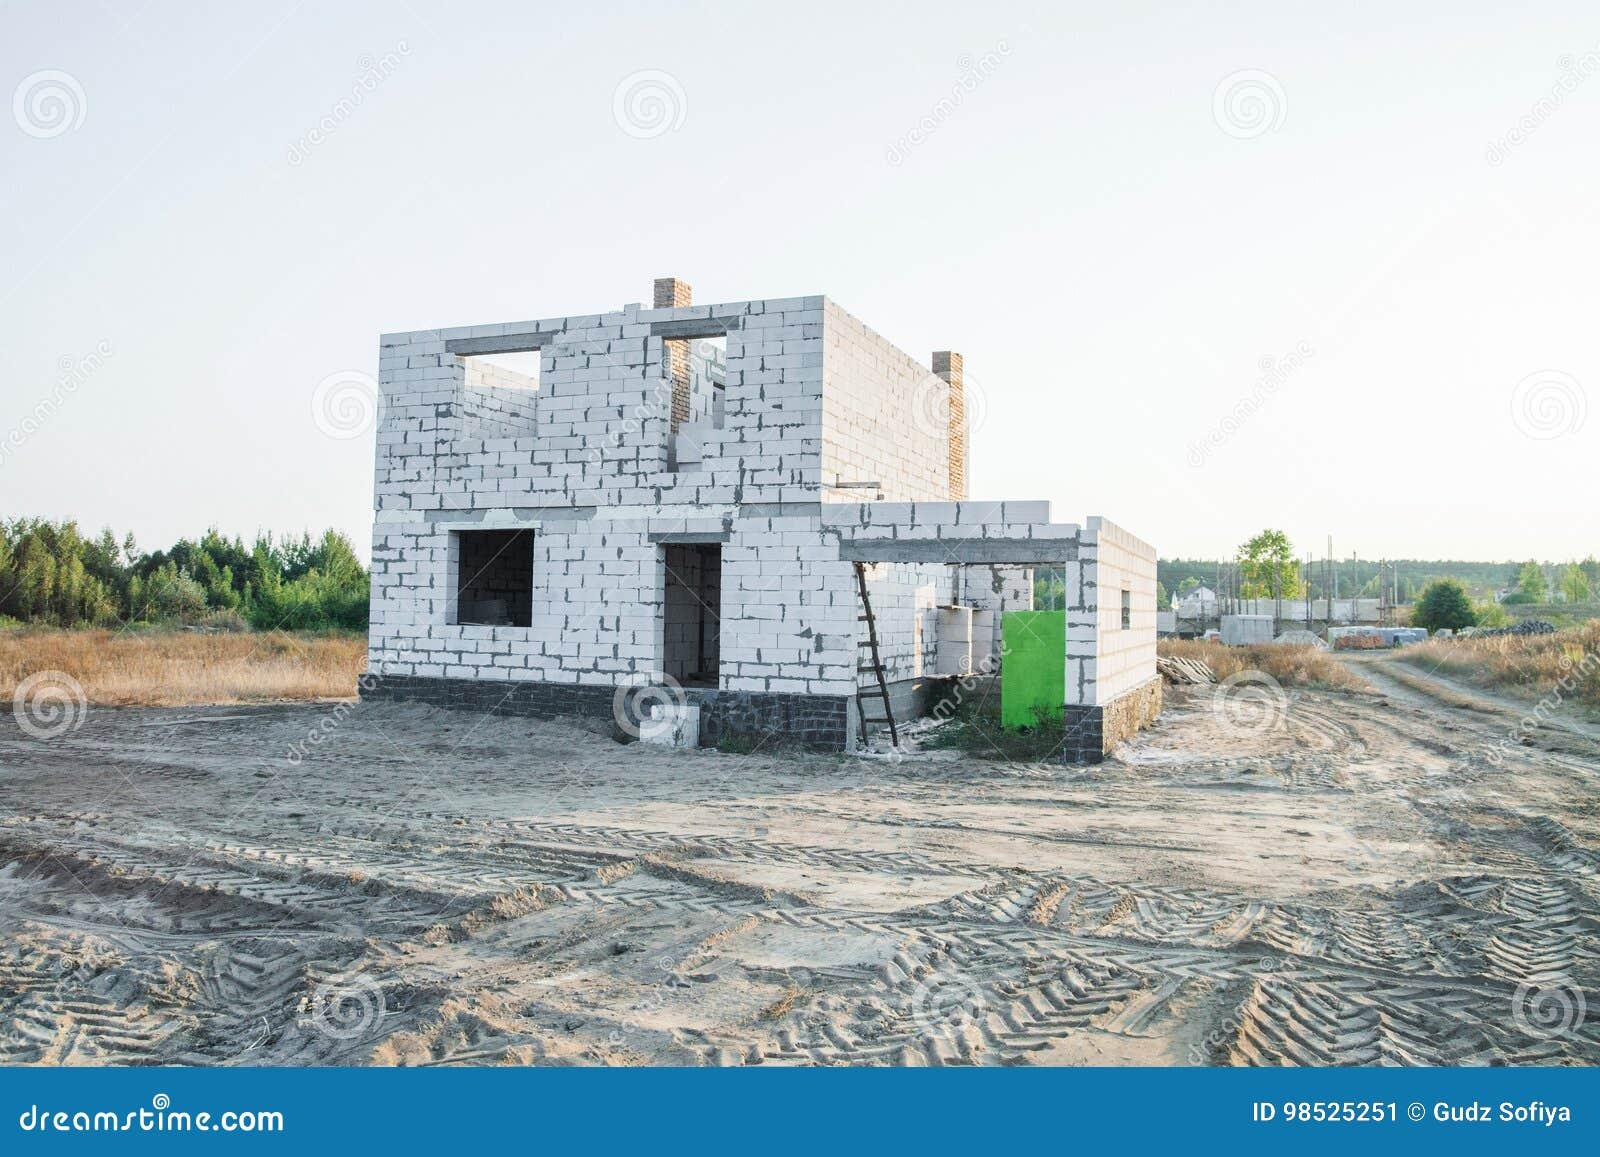 IZOBLOK大厦系统 未完成的房子的建筑